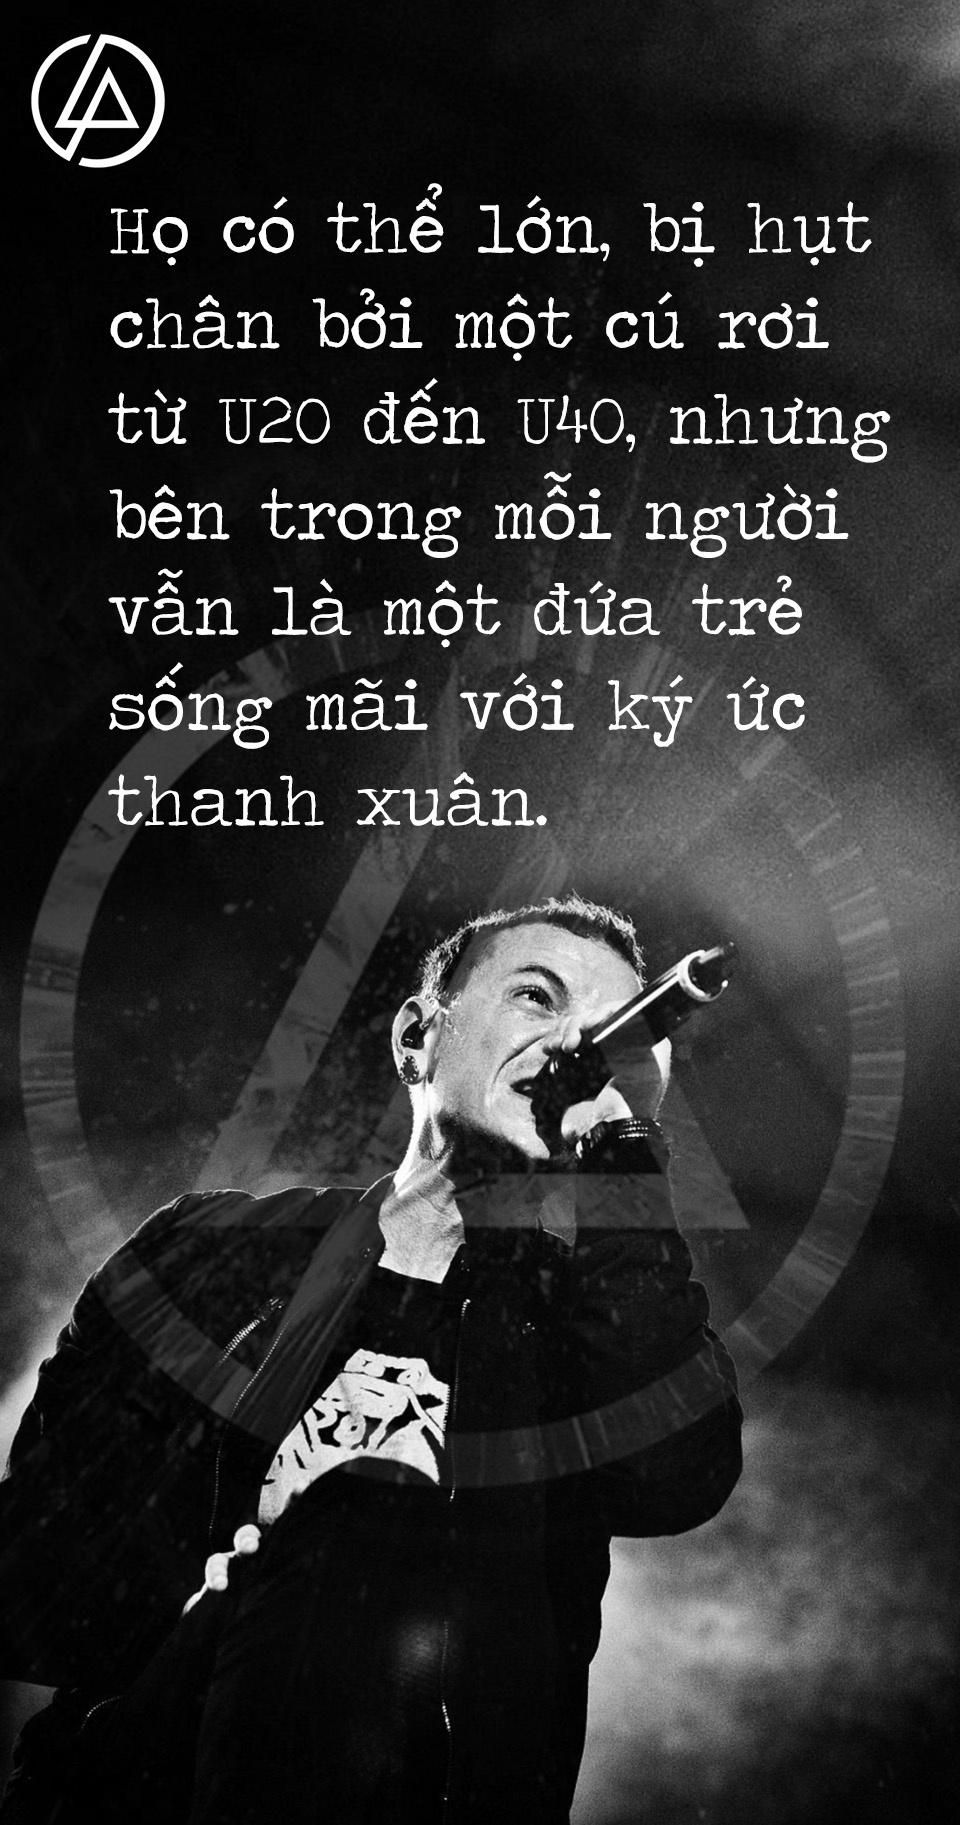 Linkin Park: Thanh am tuoi tre cua mot the he fan Viet hinh anh 6